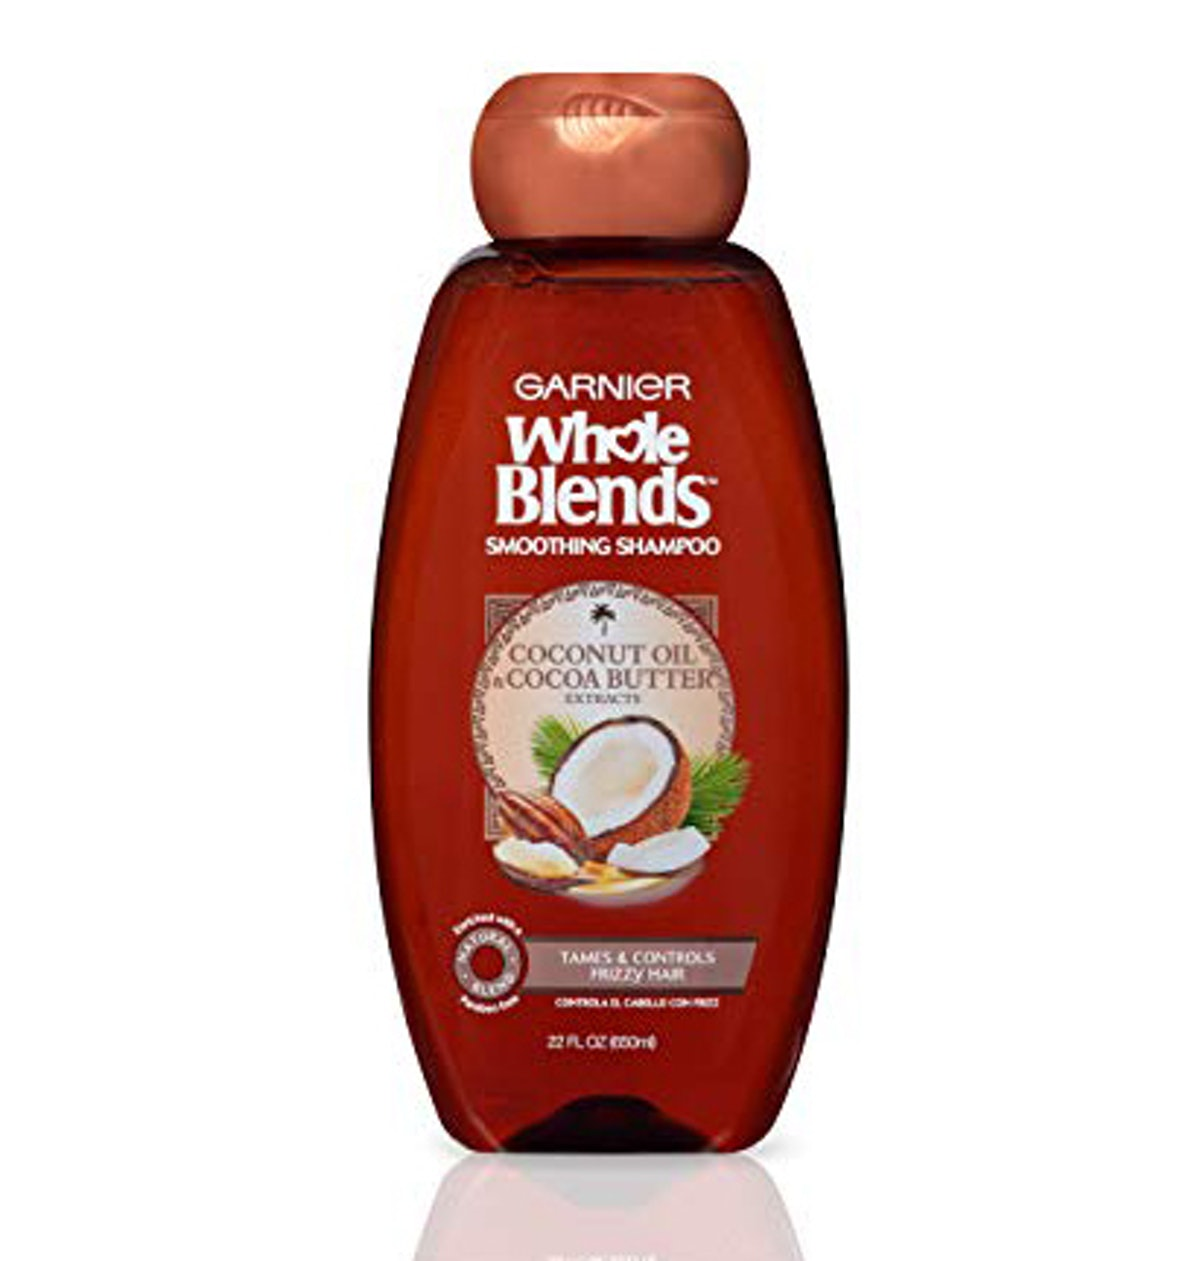 Garnier Whole Blends Smoothing Shampoo